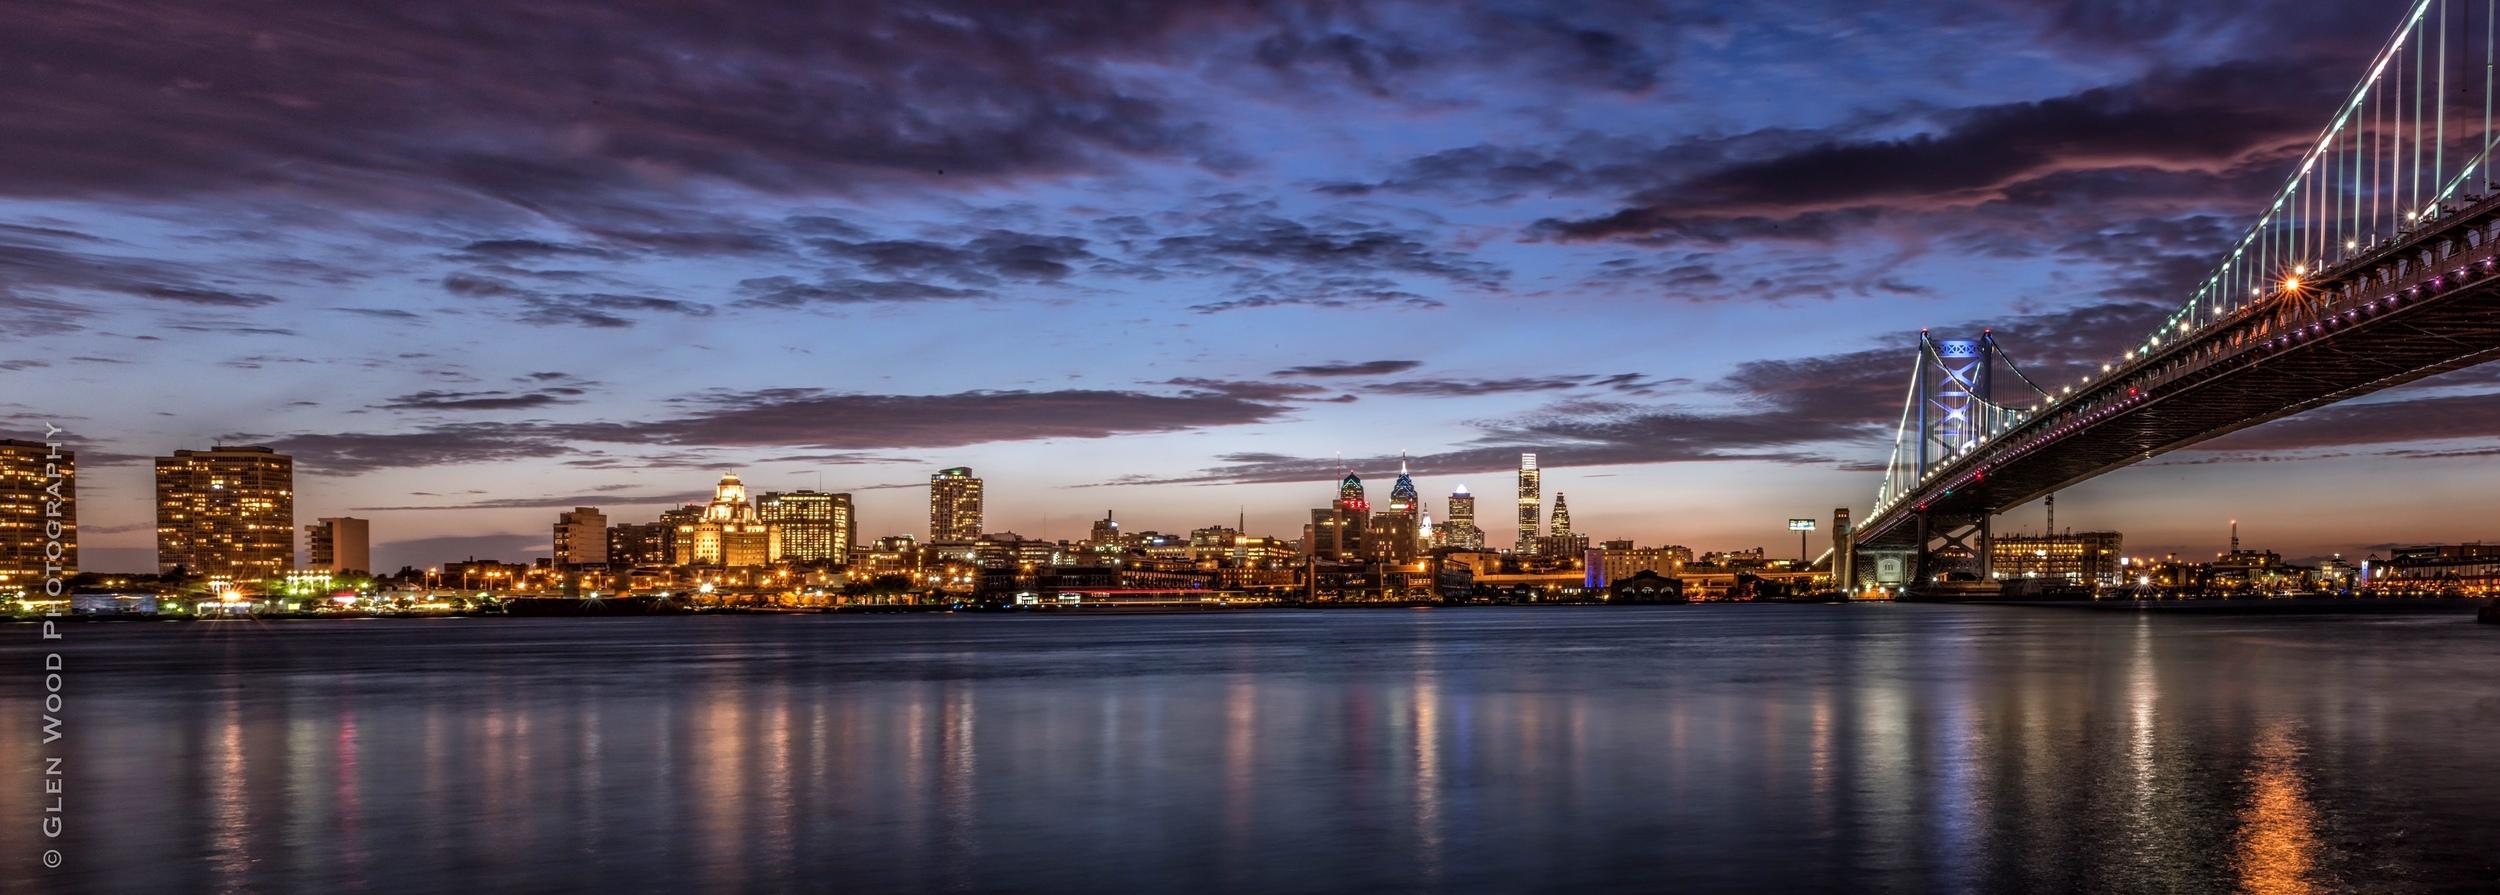 Philly by Night.JPG.jpeg